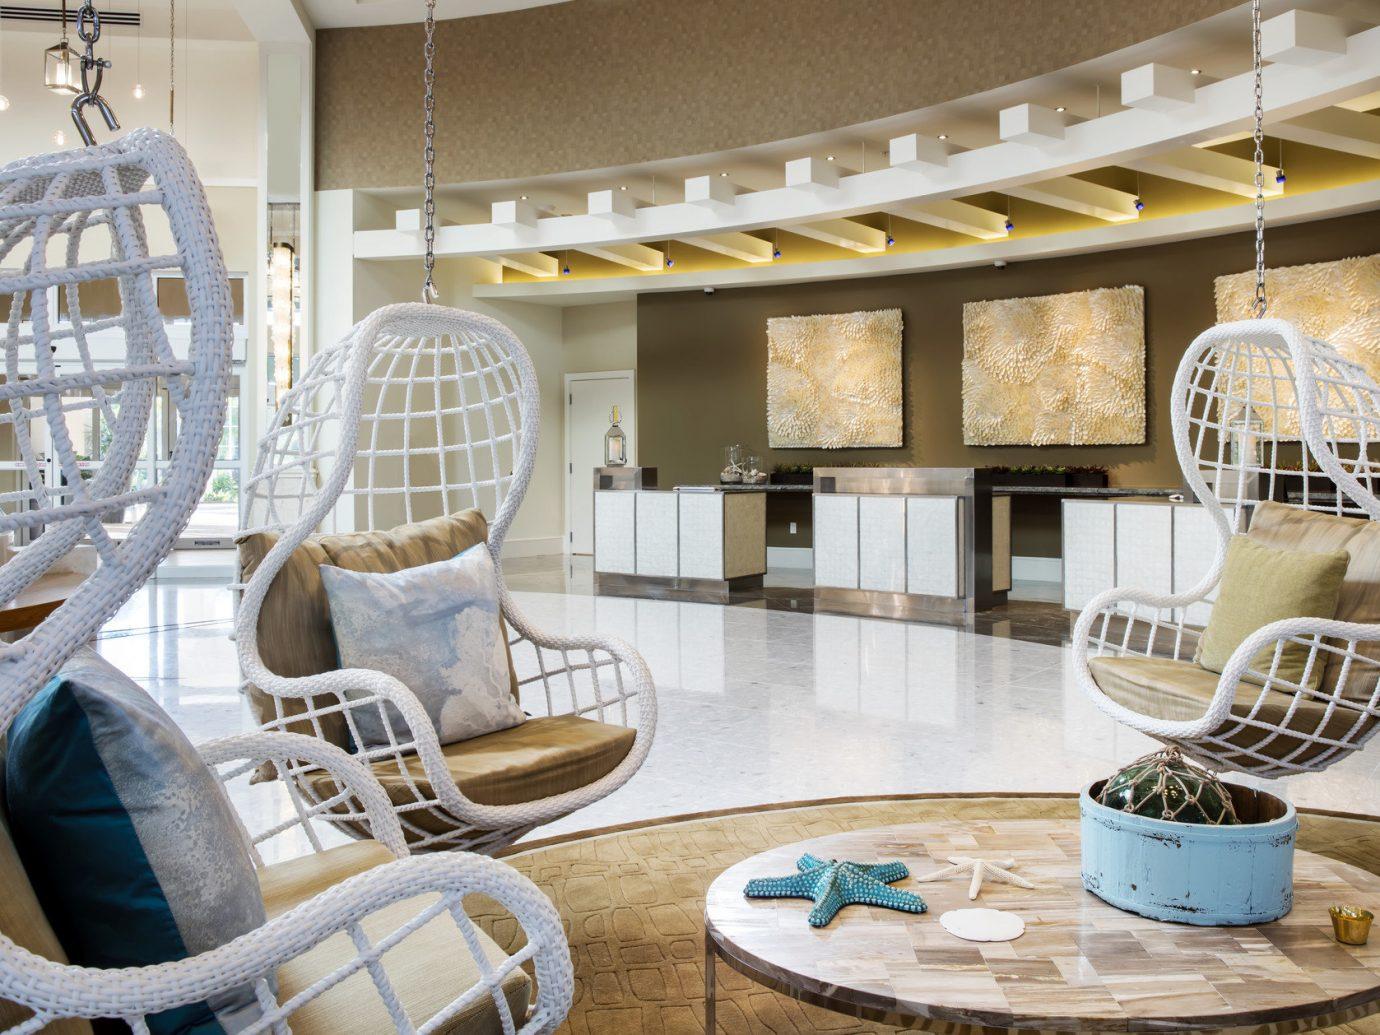 Hotels indoor chair room property dining room living room Lobby interior design home floor estate Design condominium dining table